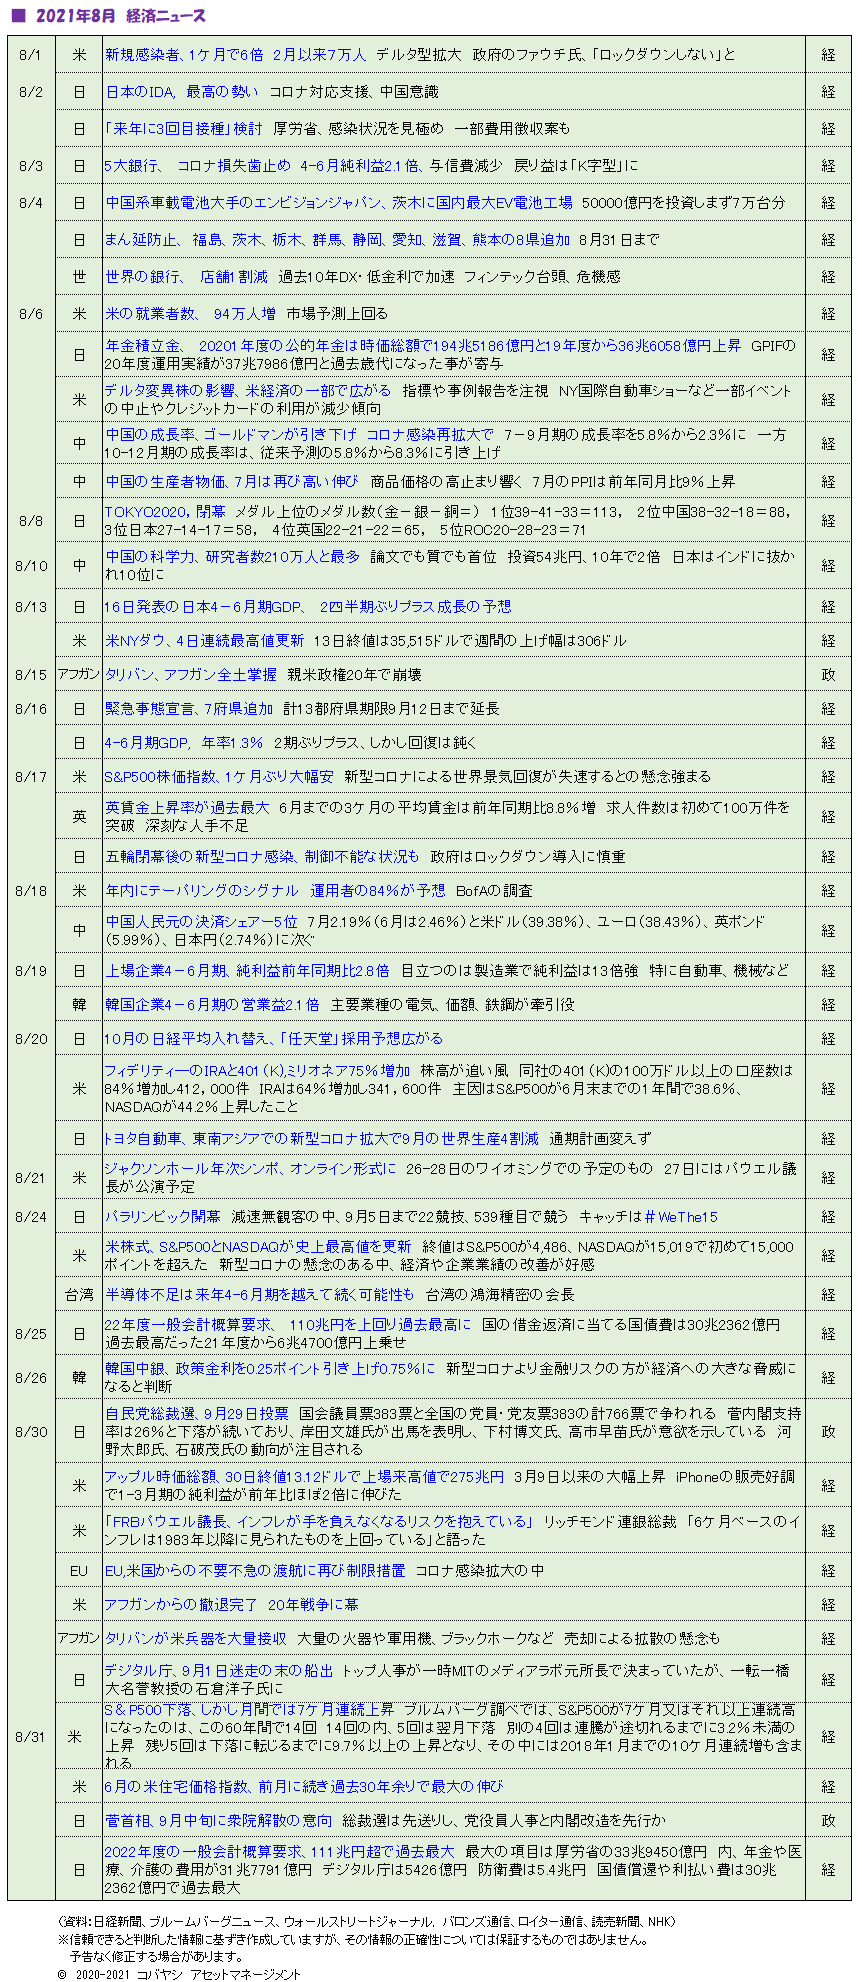 '210901_ニュース